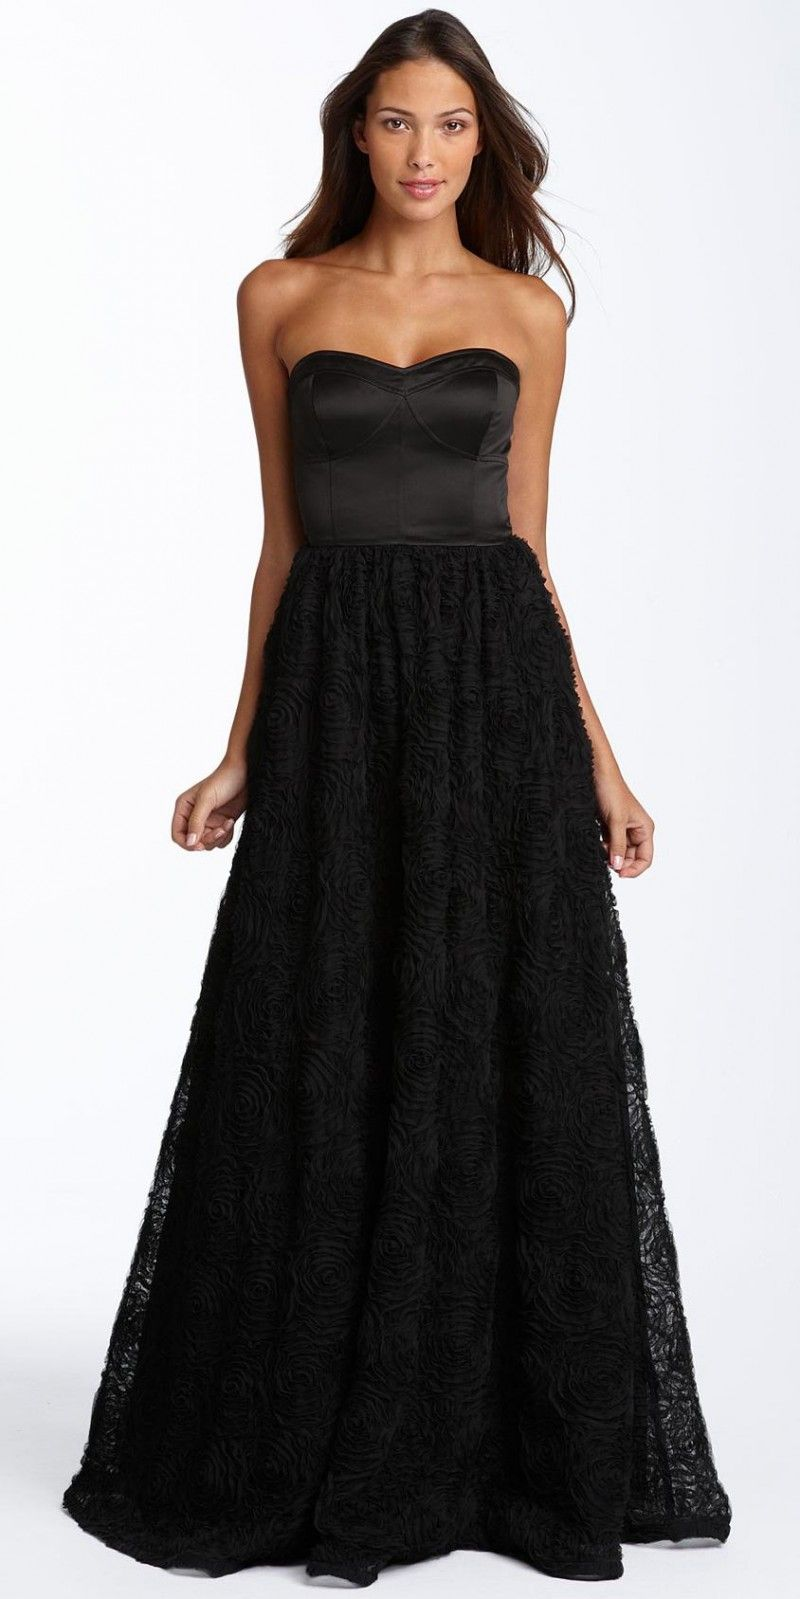 Long Black Evening Dress 2 | Tasteful Long Black Evening Dresses ...